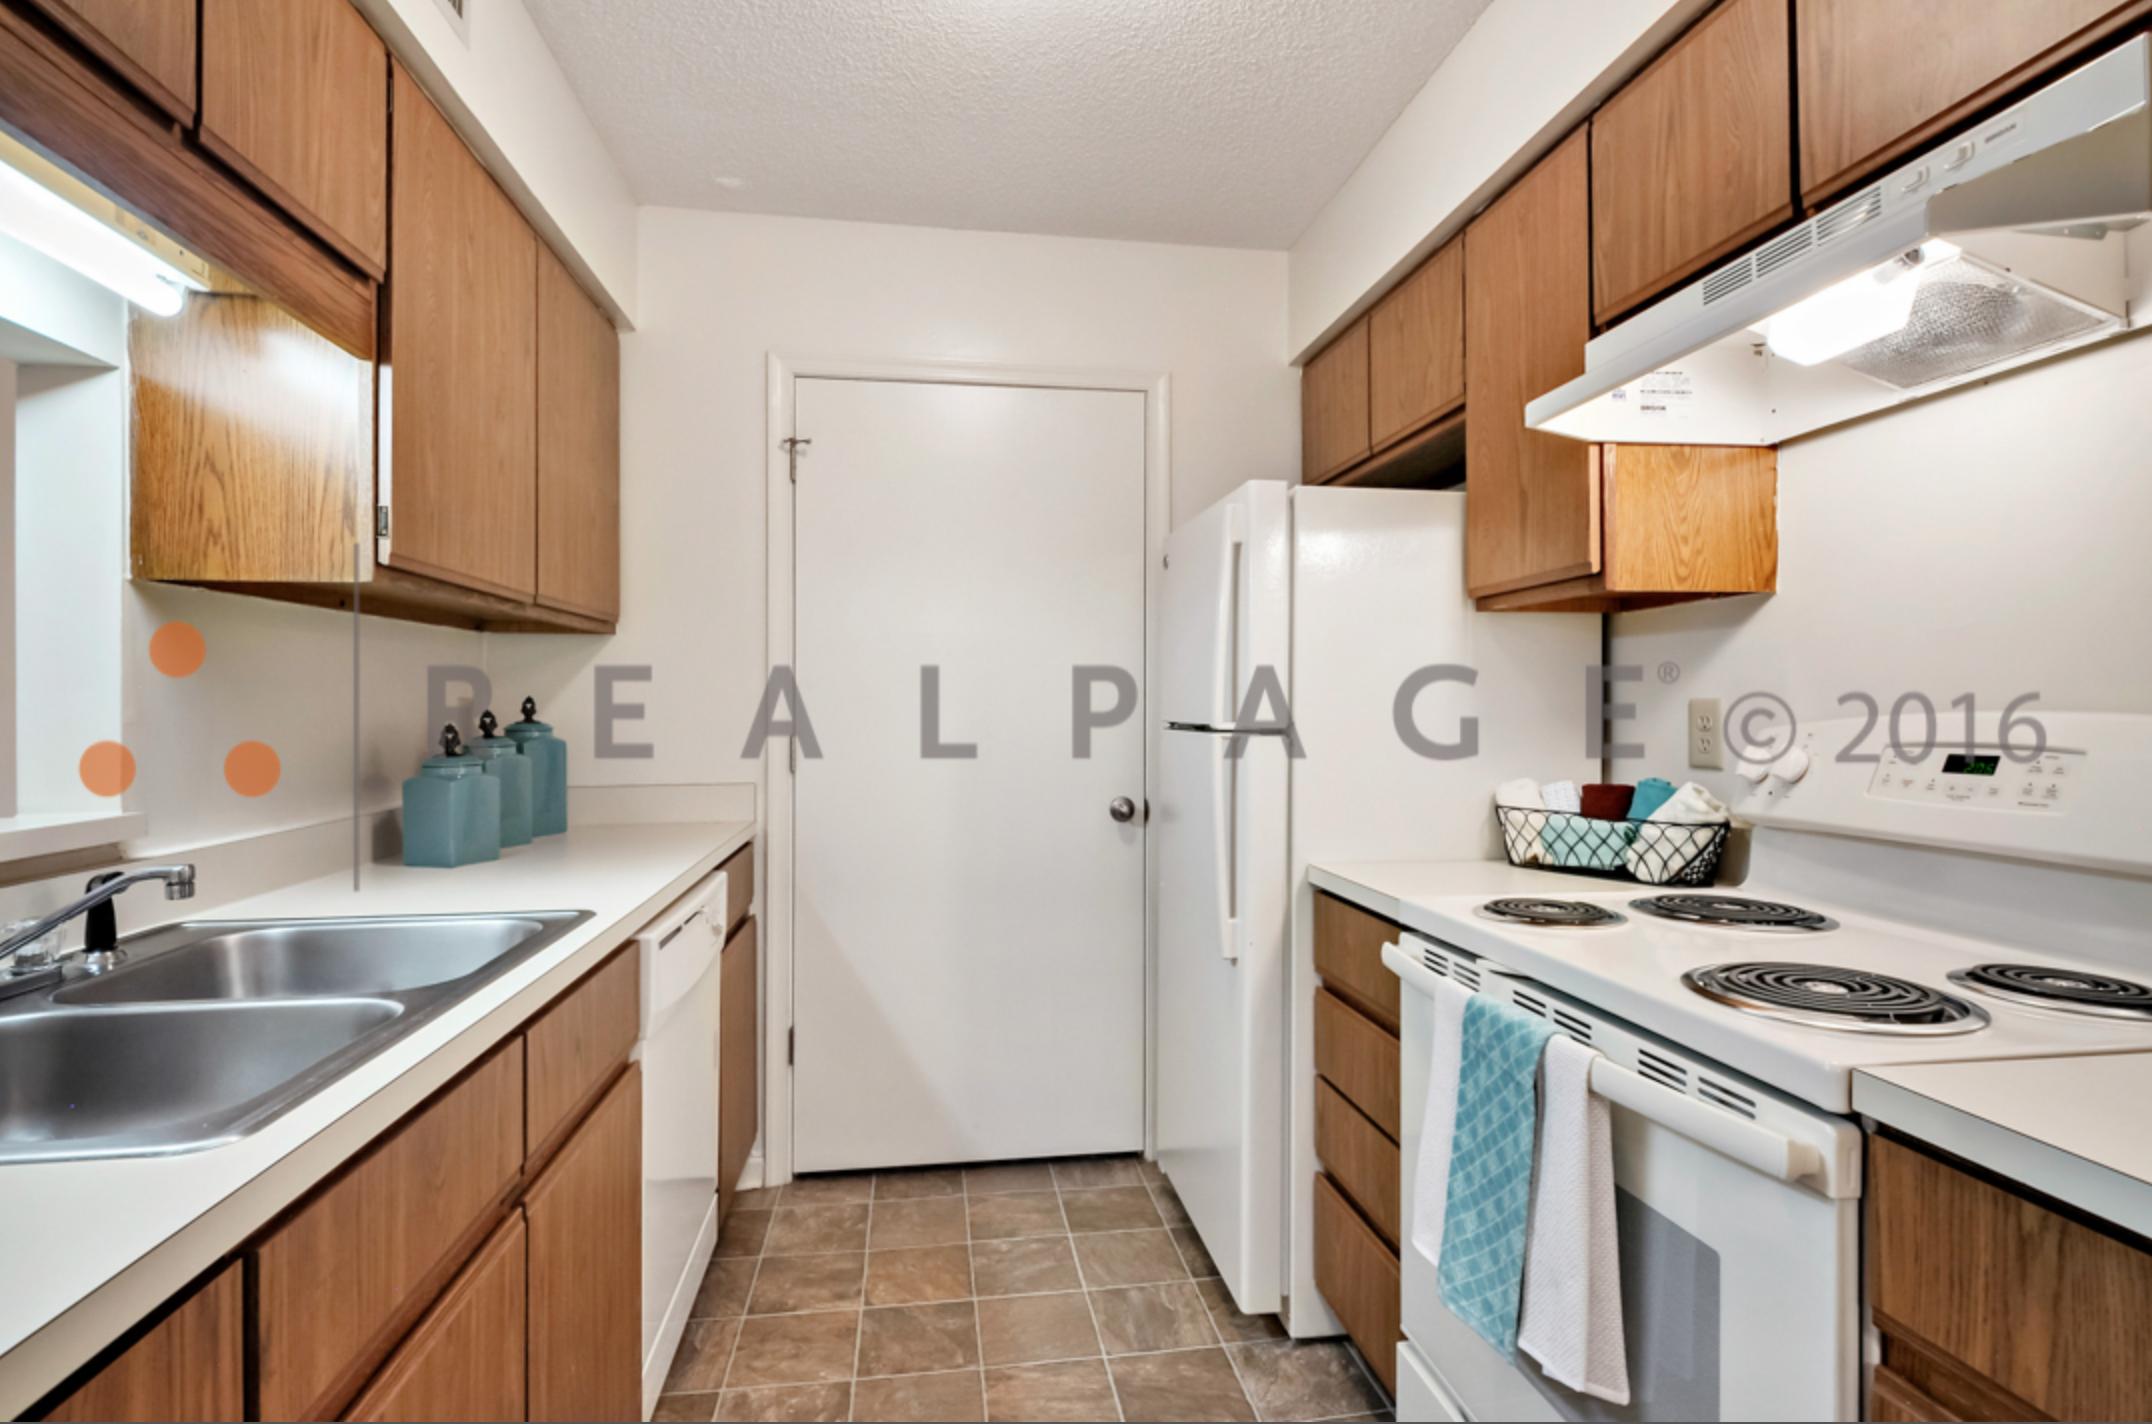 Kitchen-Wildwood-Trace-Rocky-Mount-NC-PJ03159-PH-20 1.png